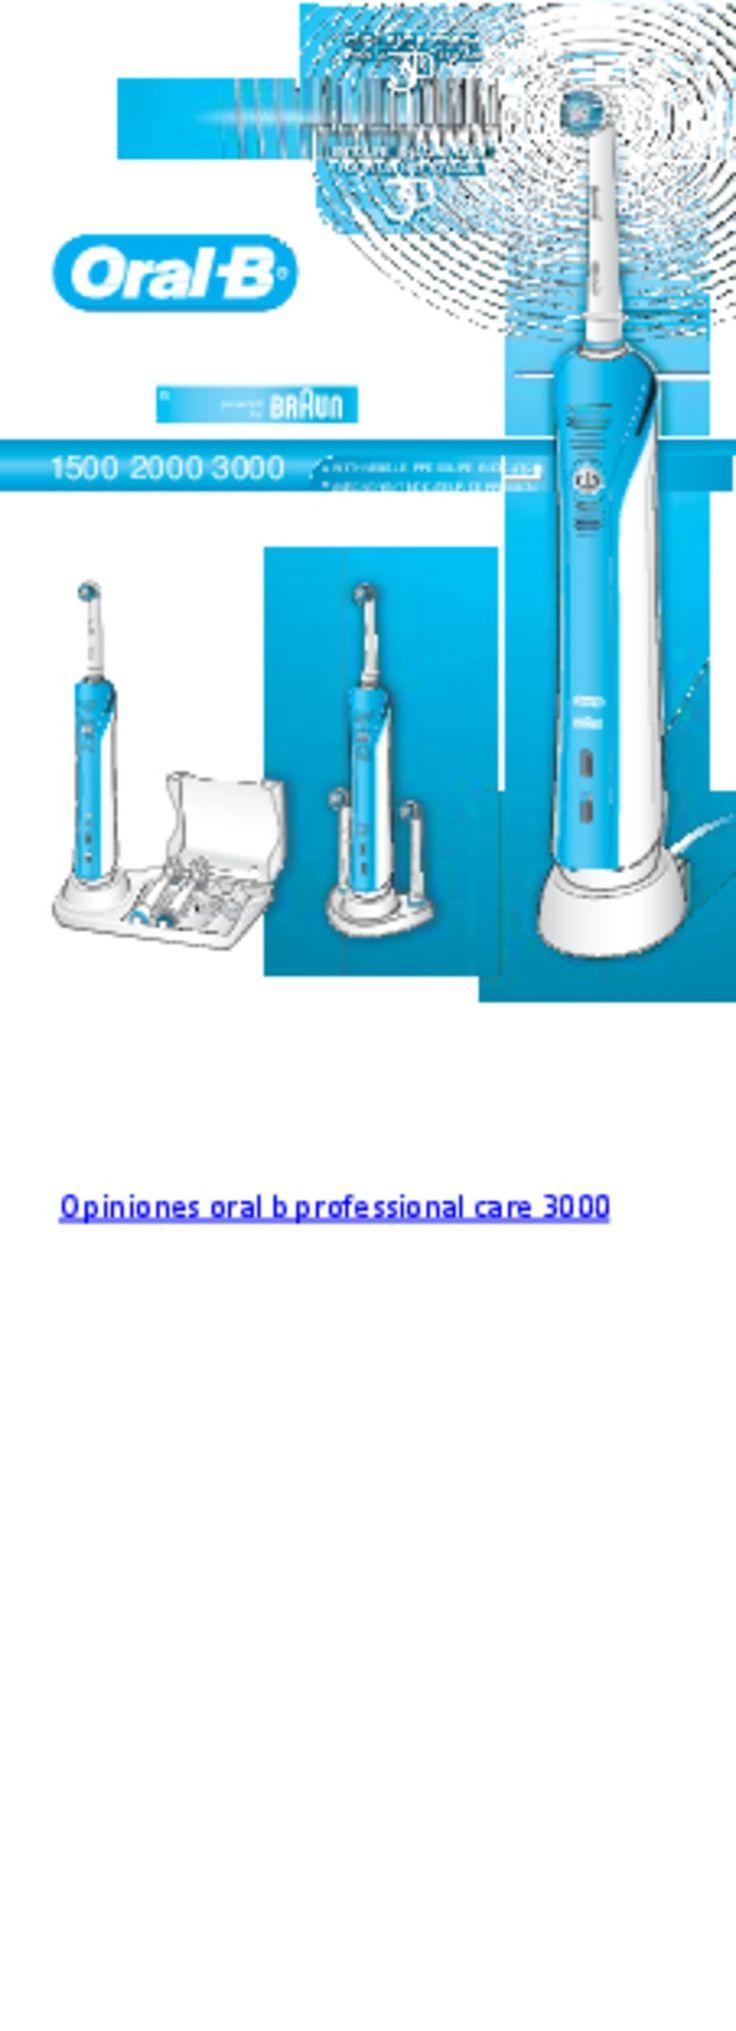 Instrucciones oral b professional care 3000 by Claudiu Narita via slideshare